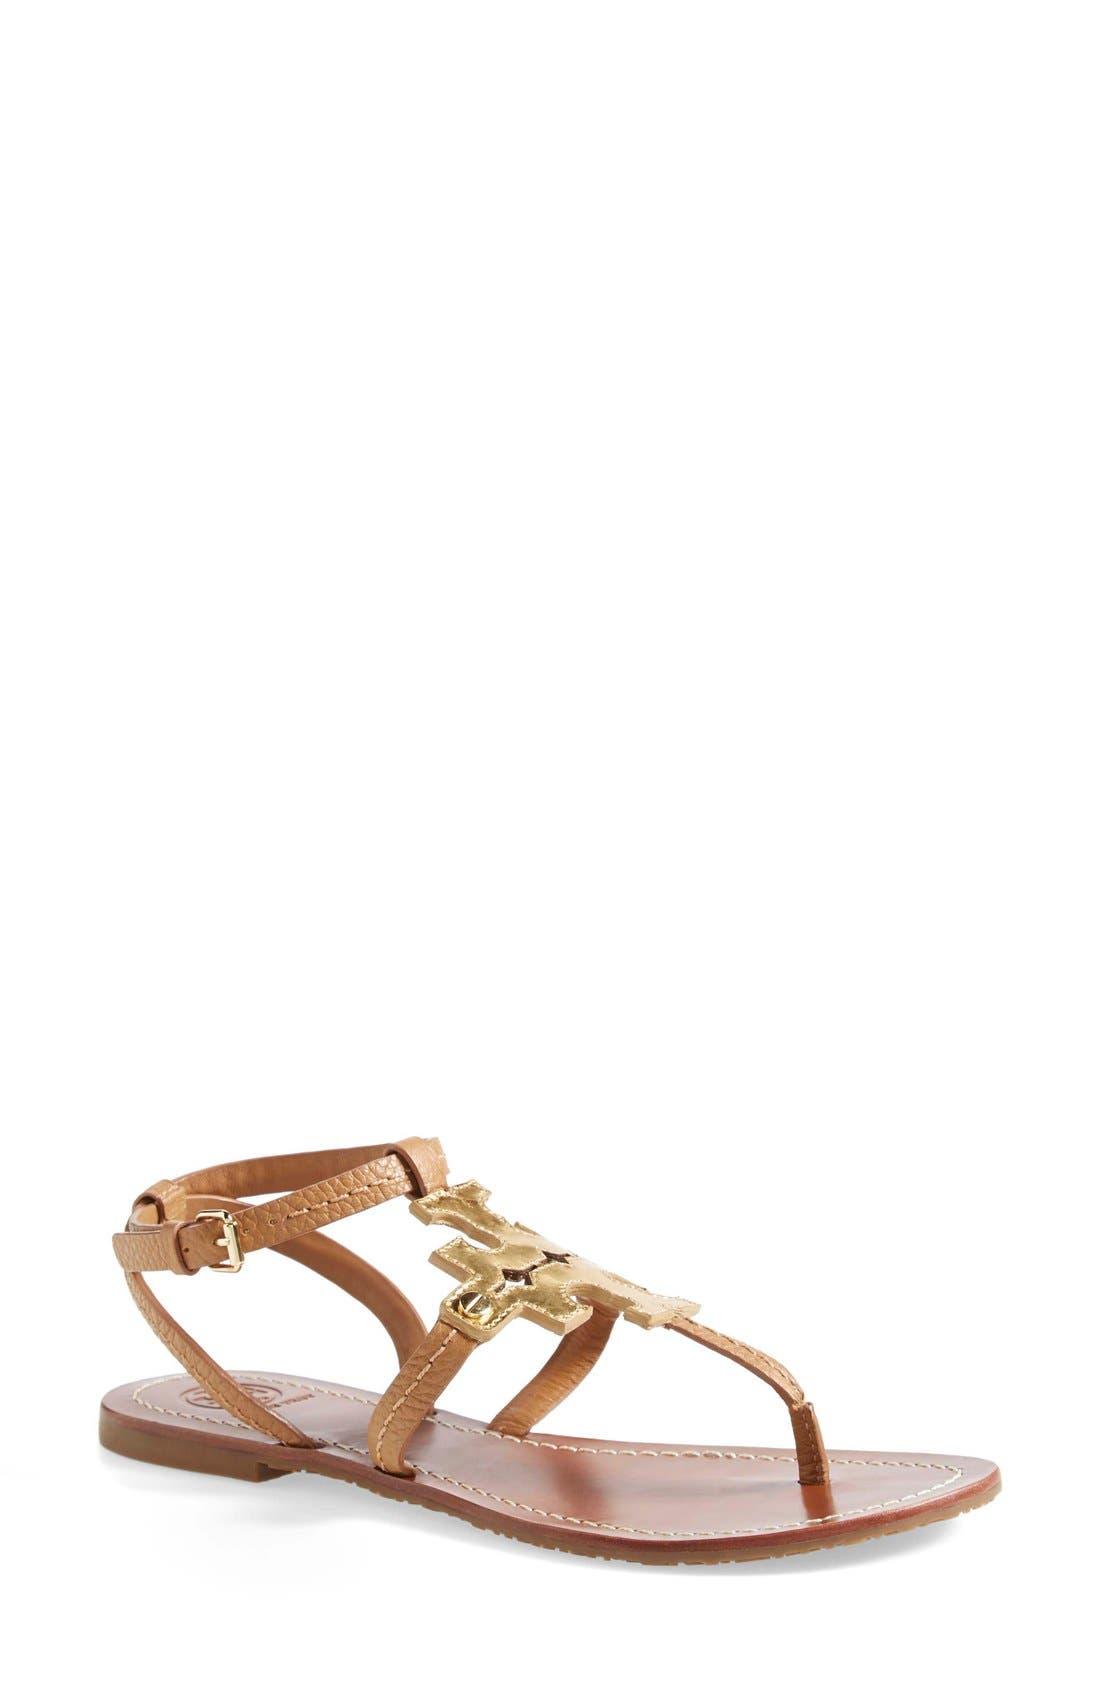 Main Image - Tory Burch 'Chandler' Leather Sandal (Women)